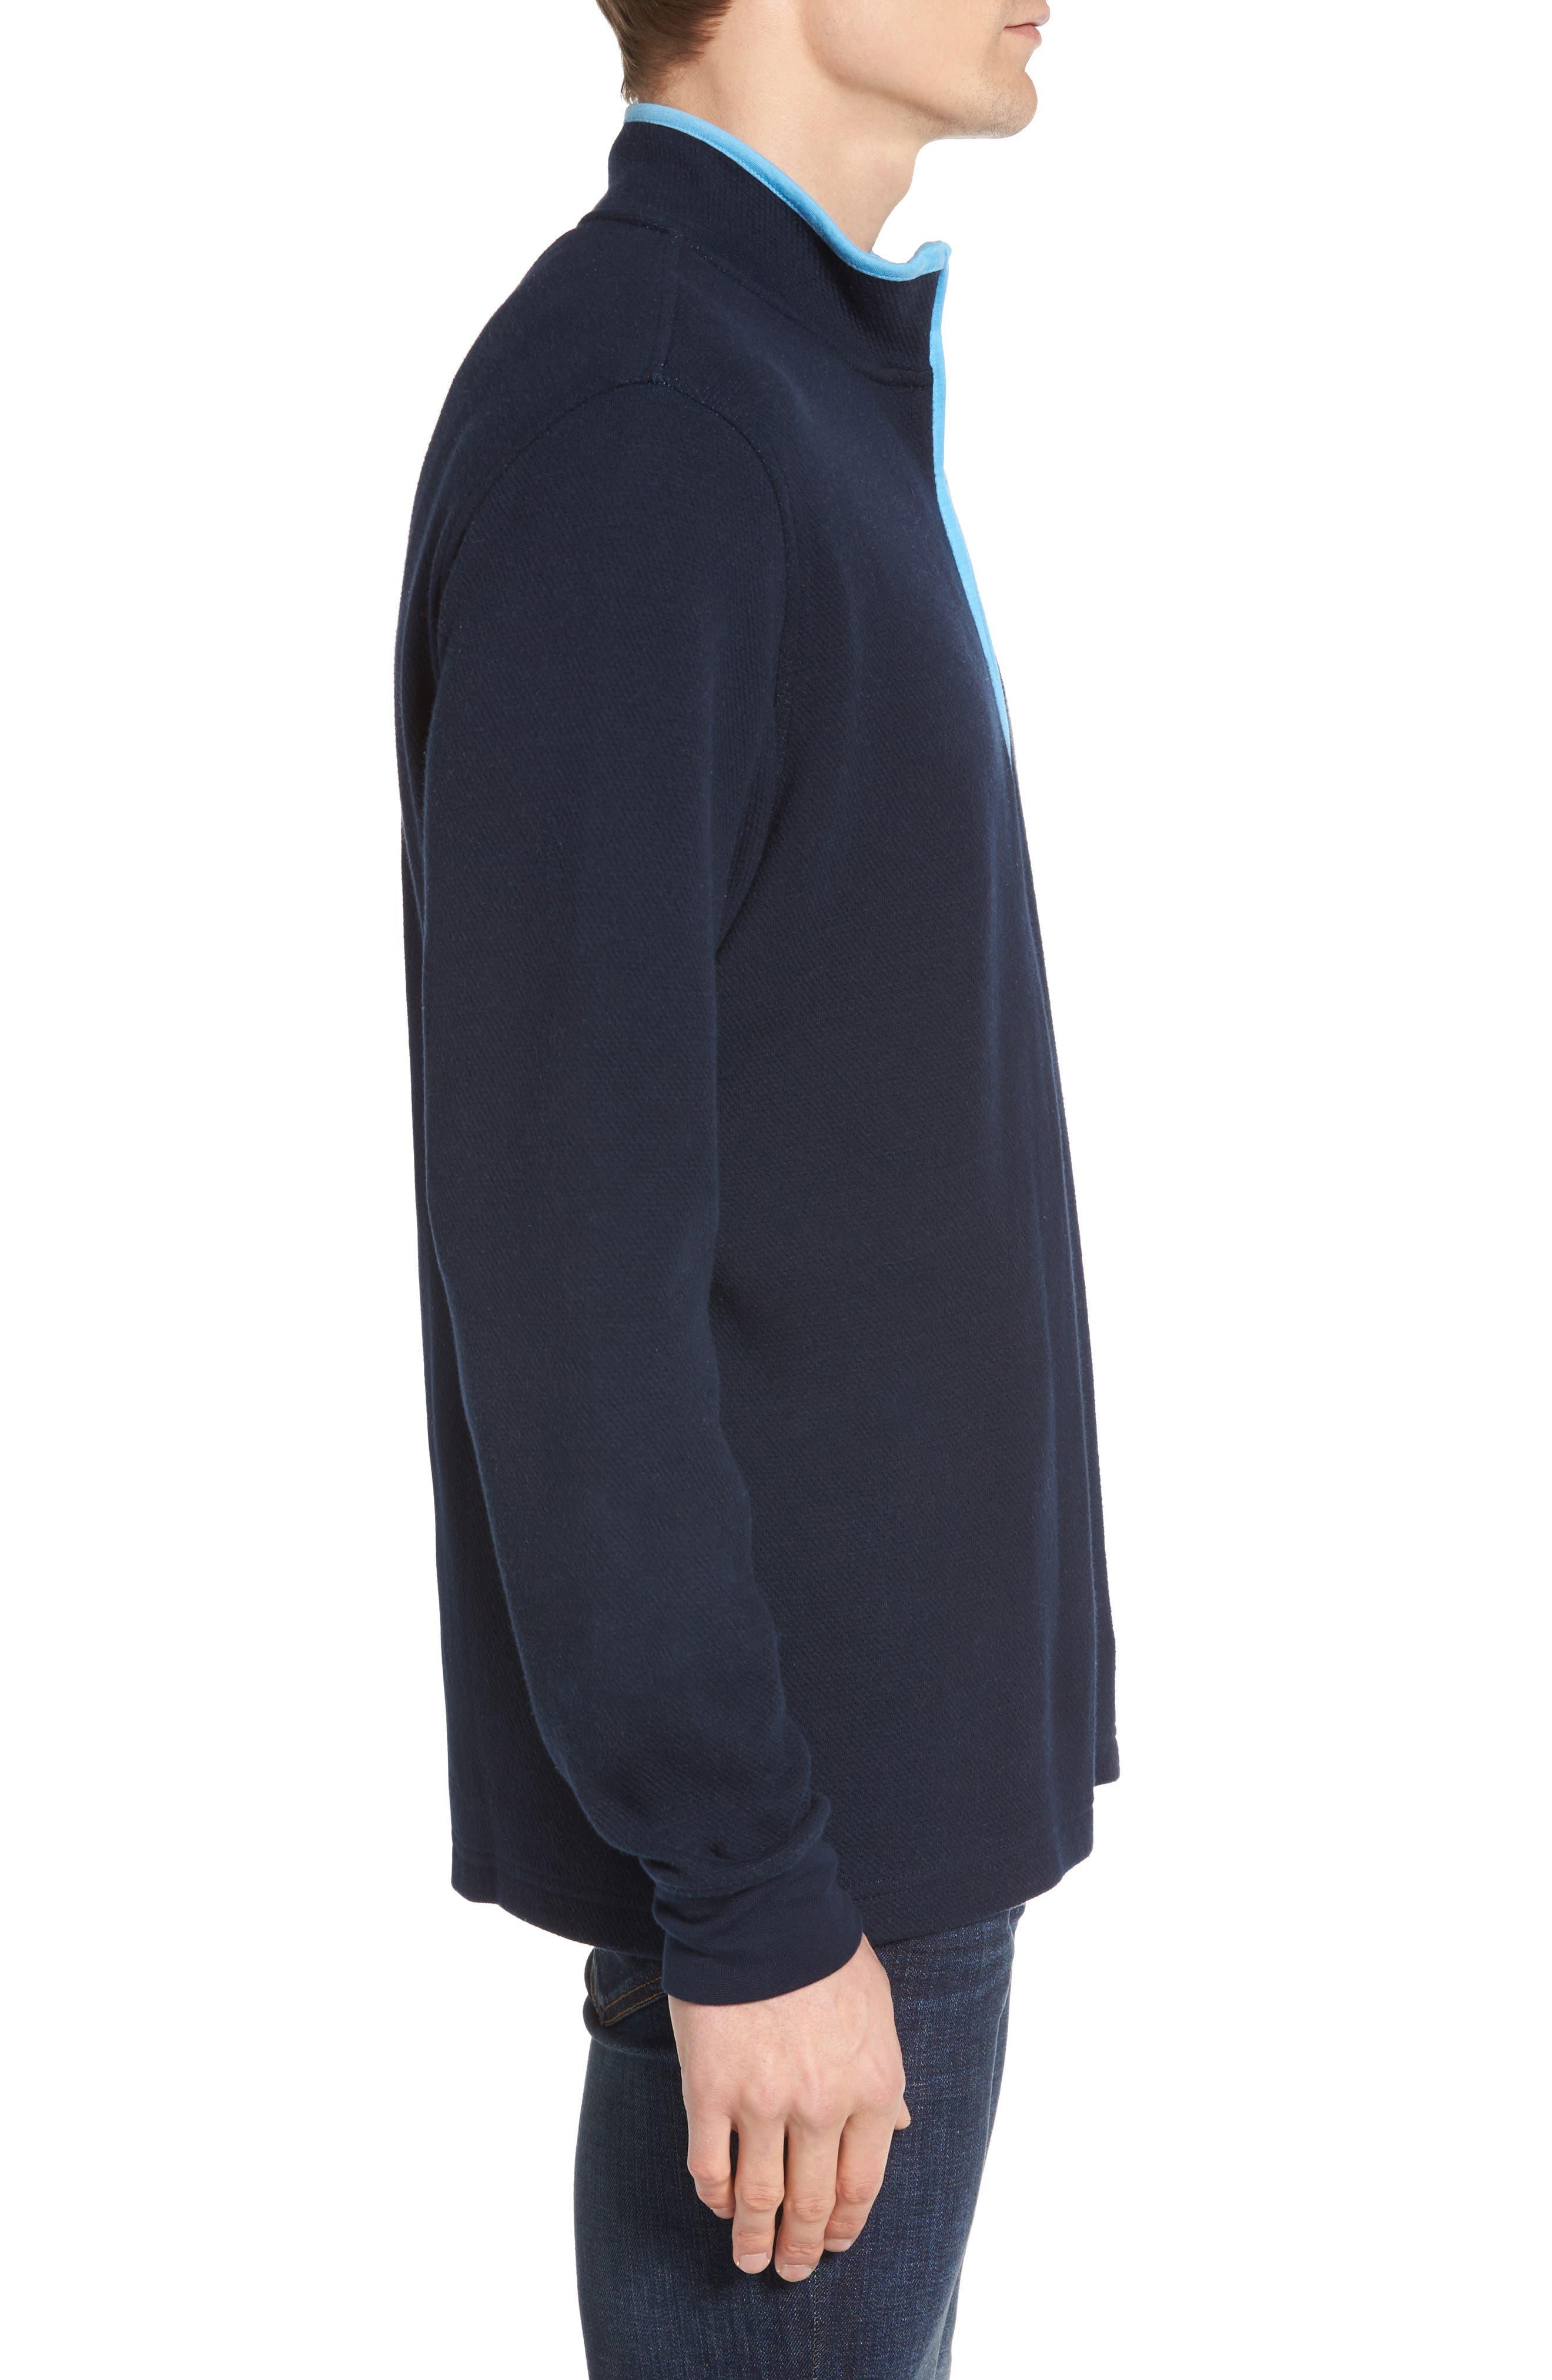 Alternate Image 3  - Psycho Bunny Golf Half Zip Pullover